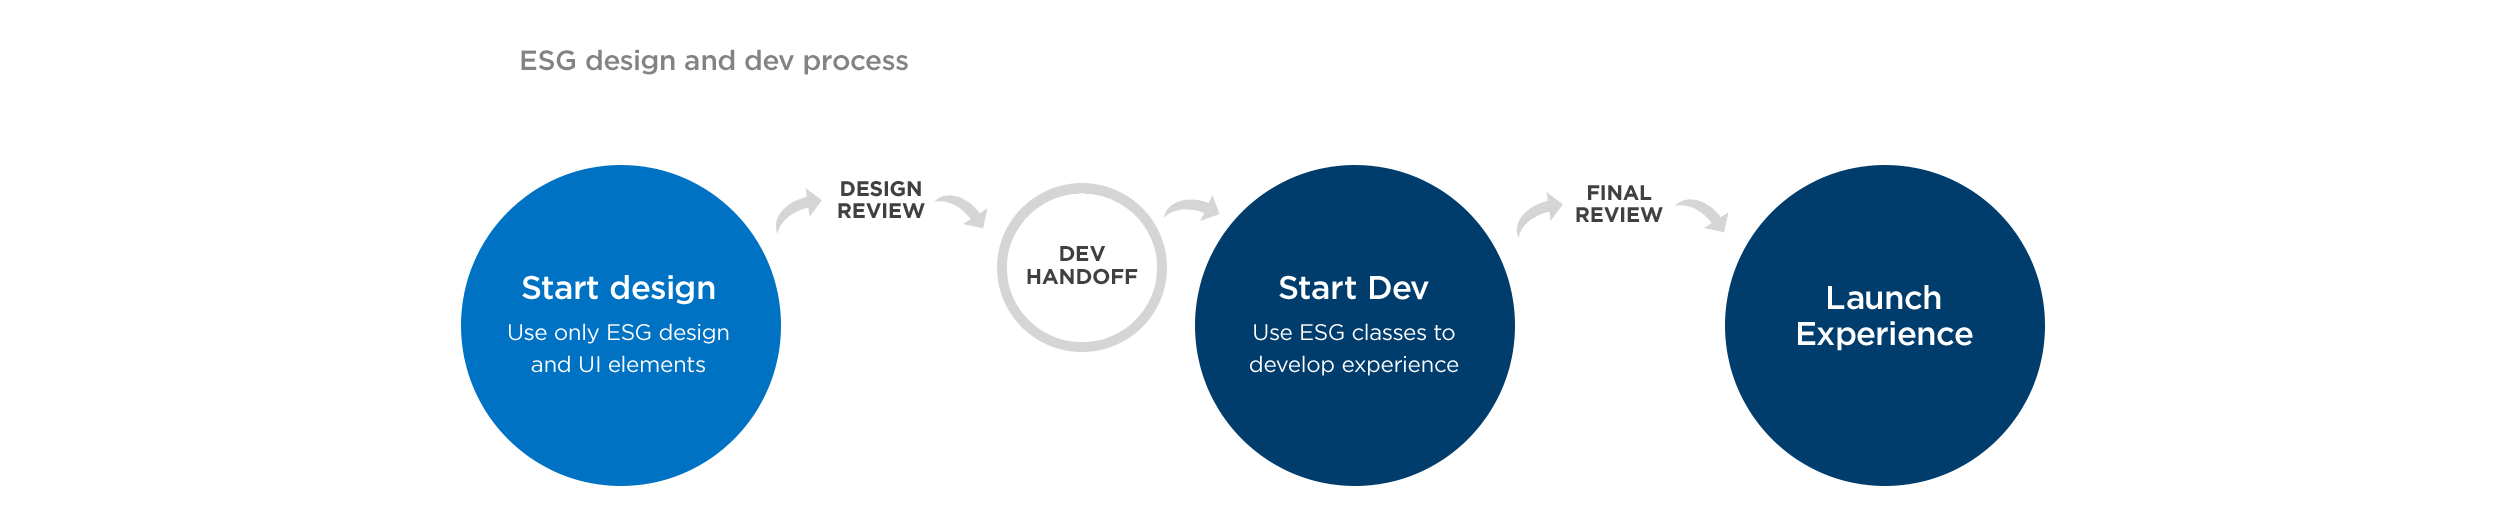 New design / development process, much more streamlined